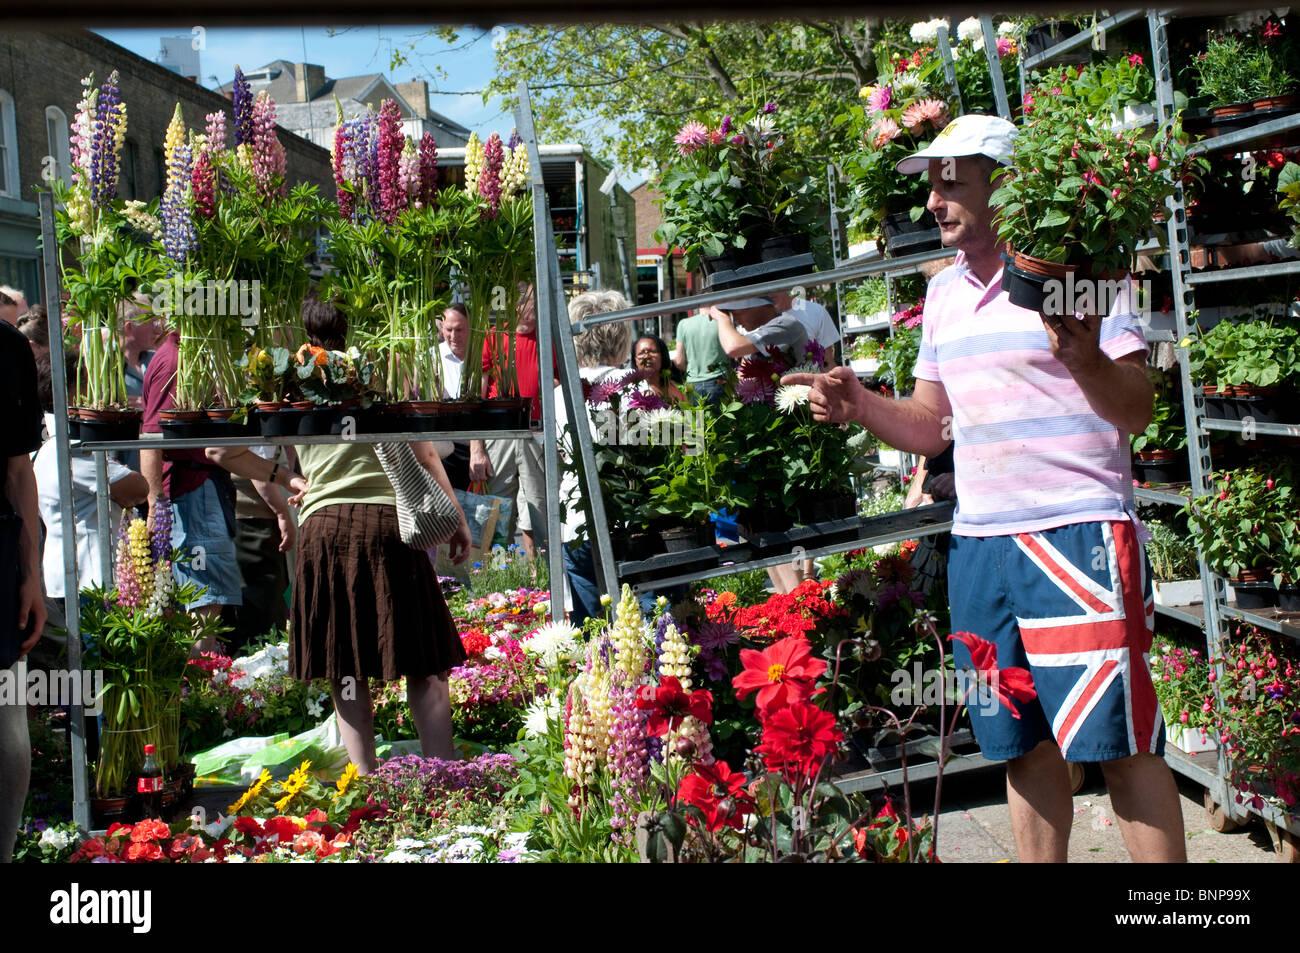 Seller showing his wares, Columbia Road Flower Market, London, E2, England, UK - Stock Image